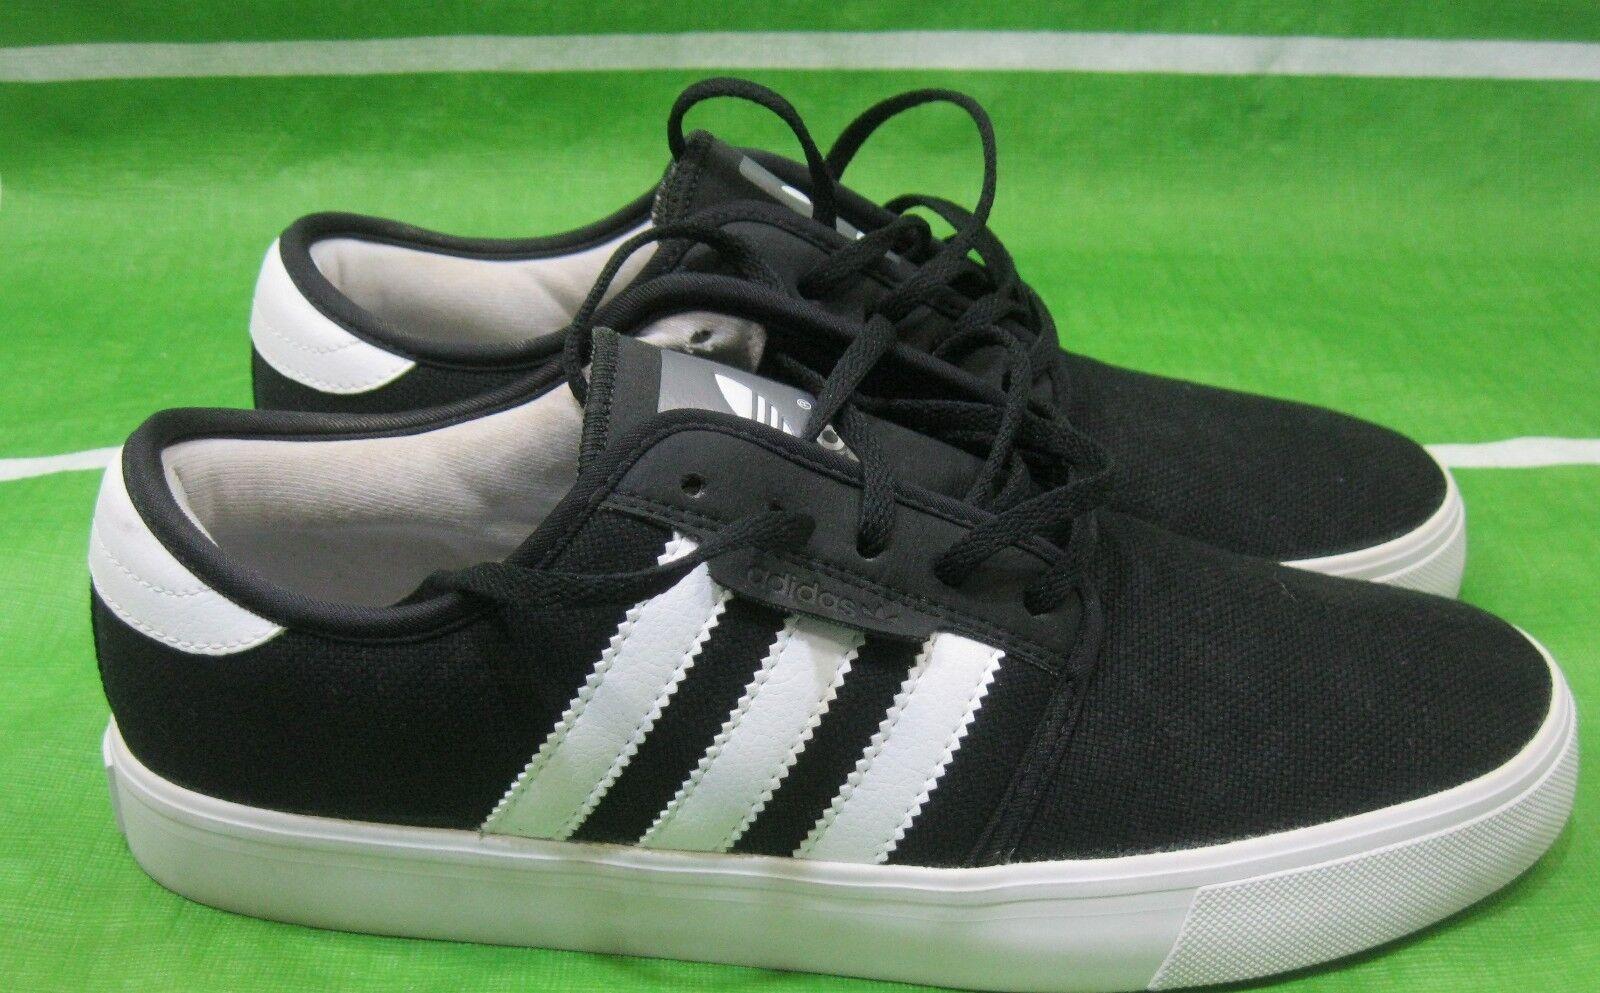 Adidas Originals Men's Seeley Canvas Sneaker, G23703, Black/White  Size 8